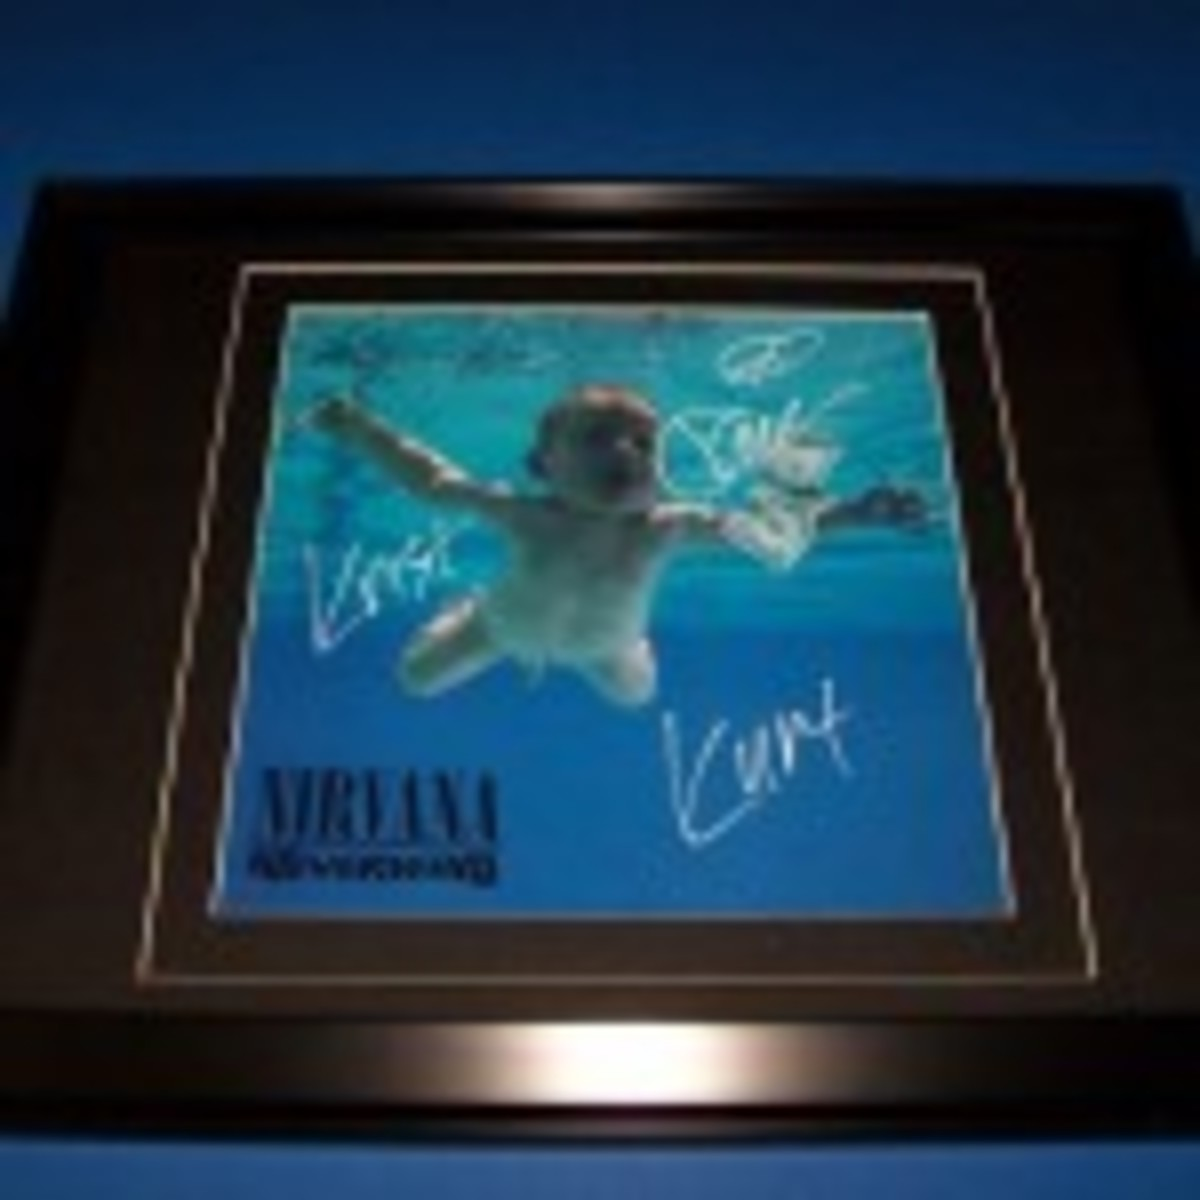 Nirvana Nevermind autographed